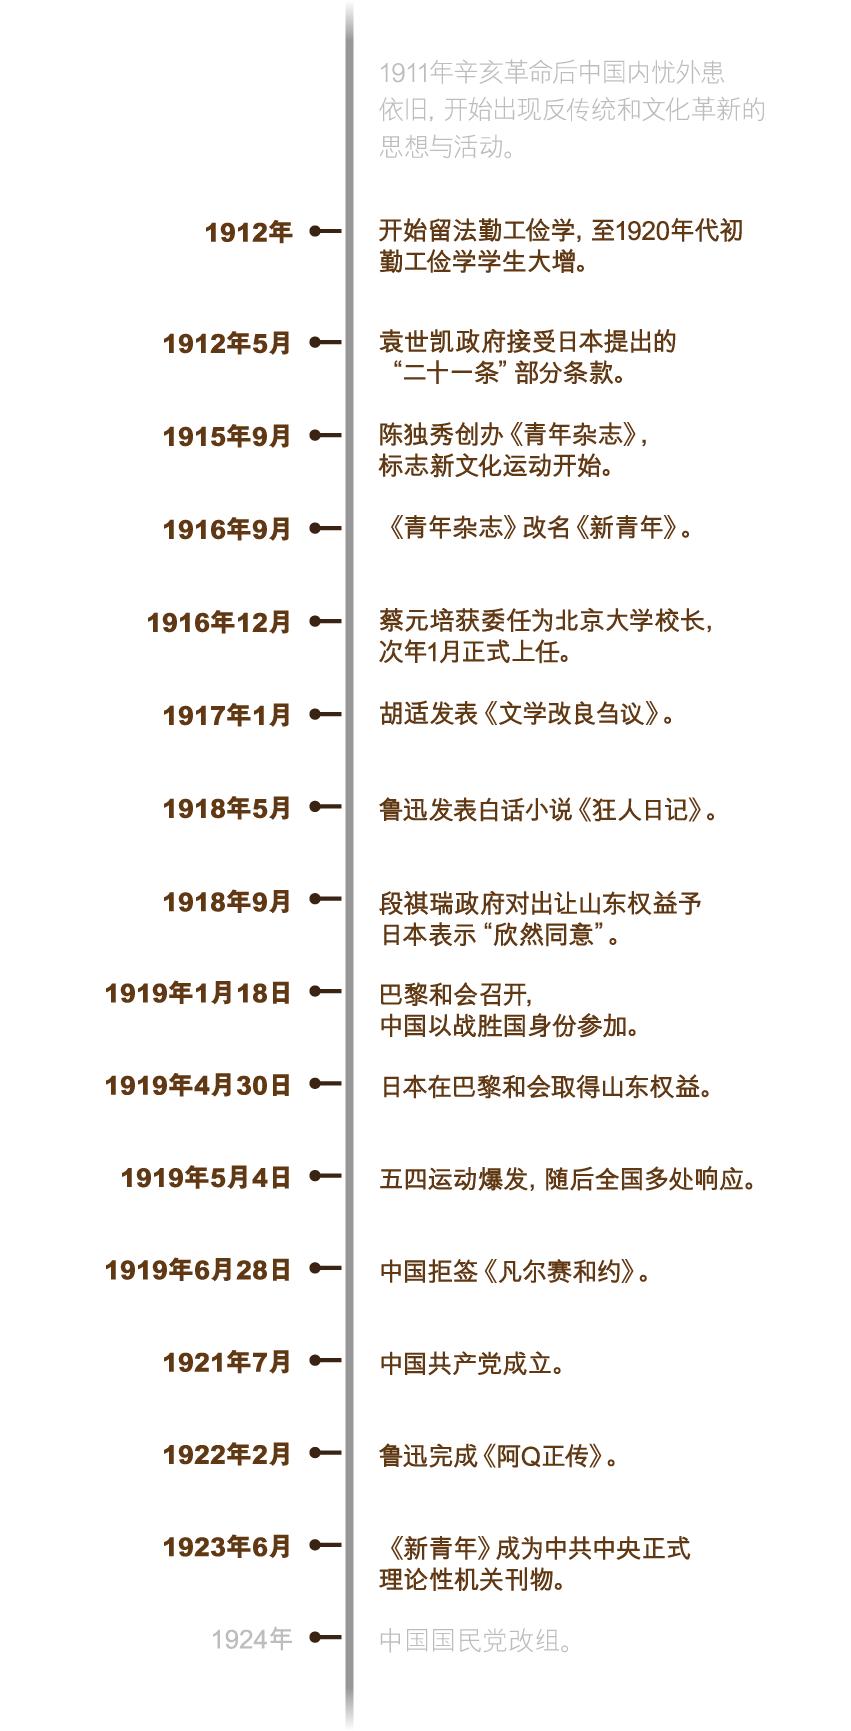 wusi_timeline_750x715_sc_v1-01